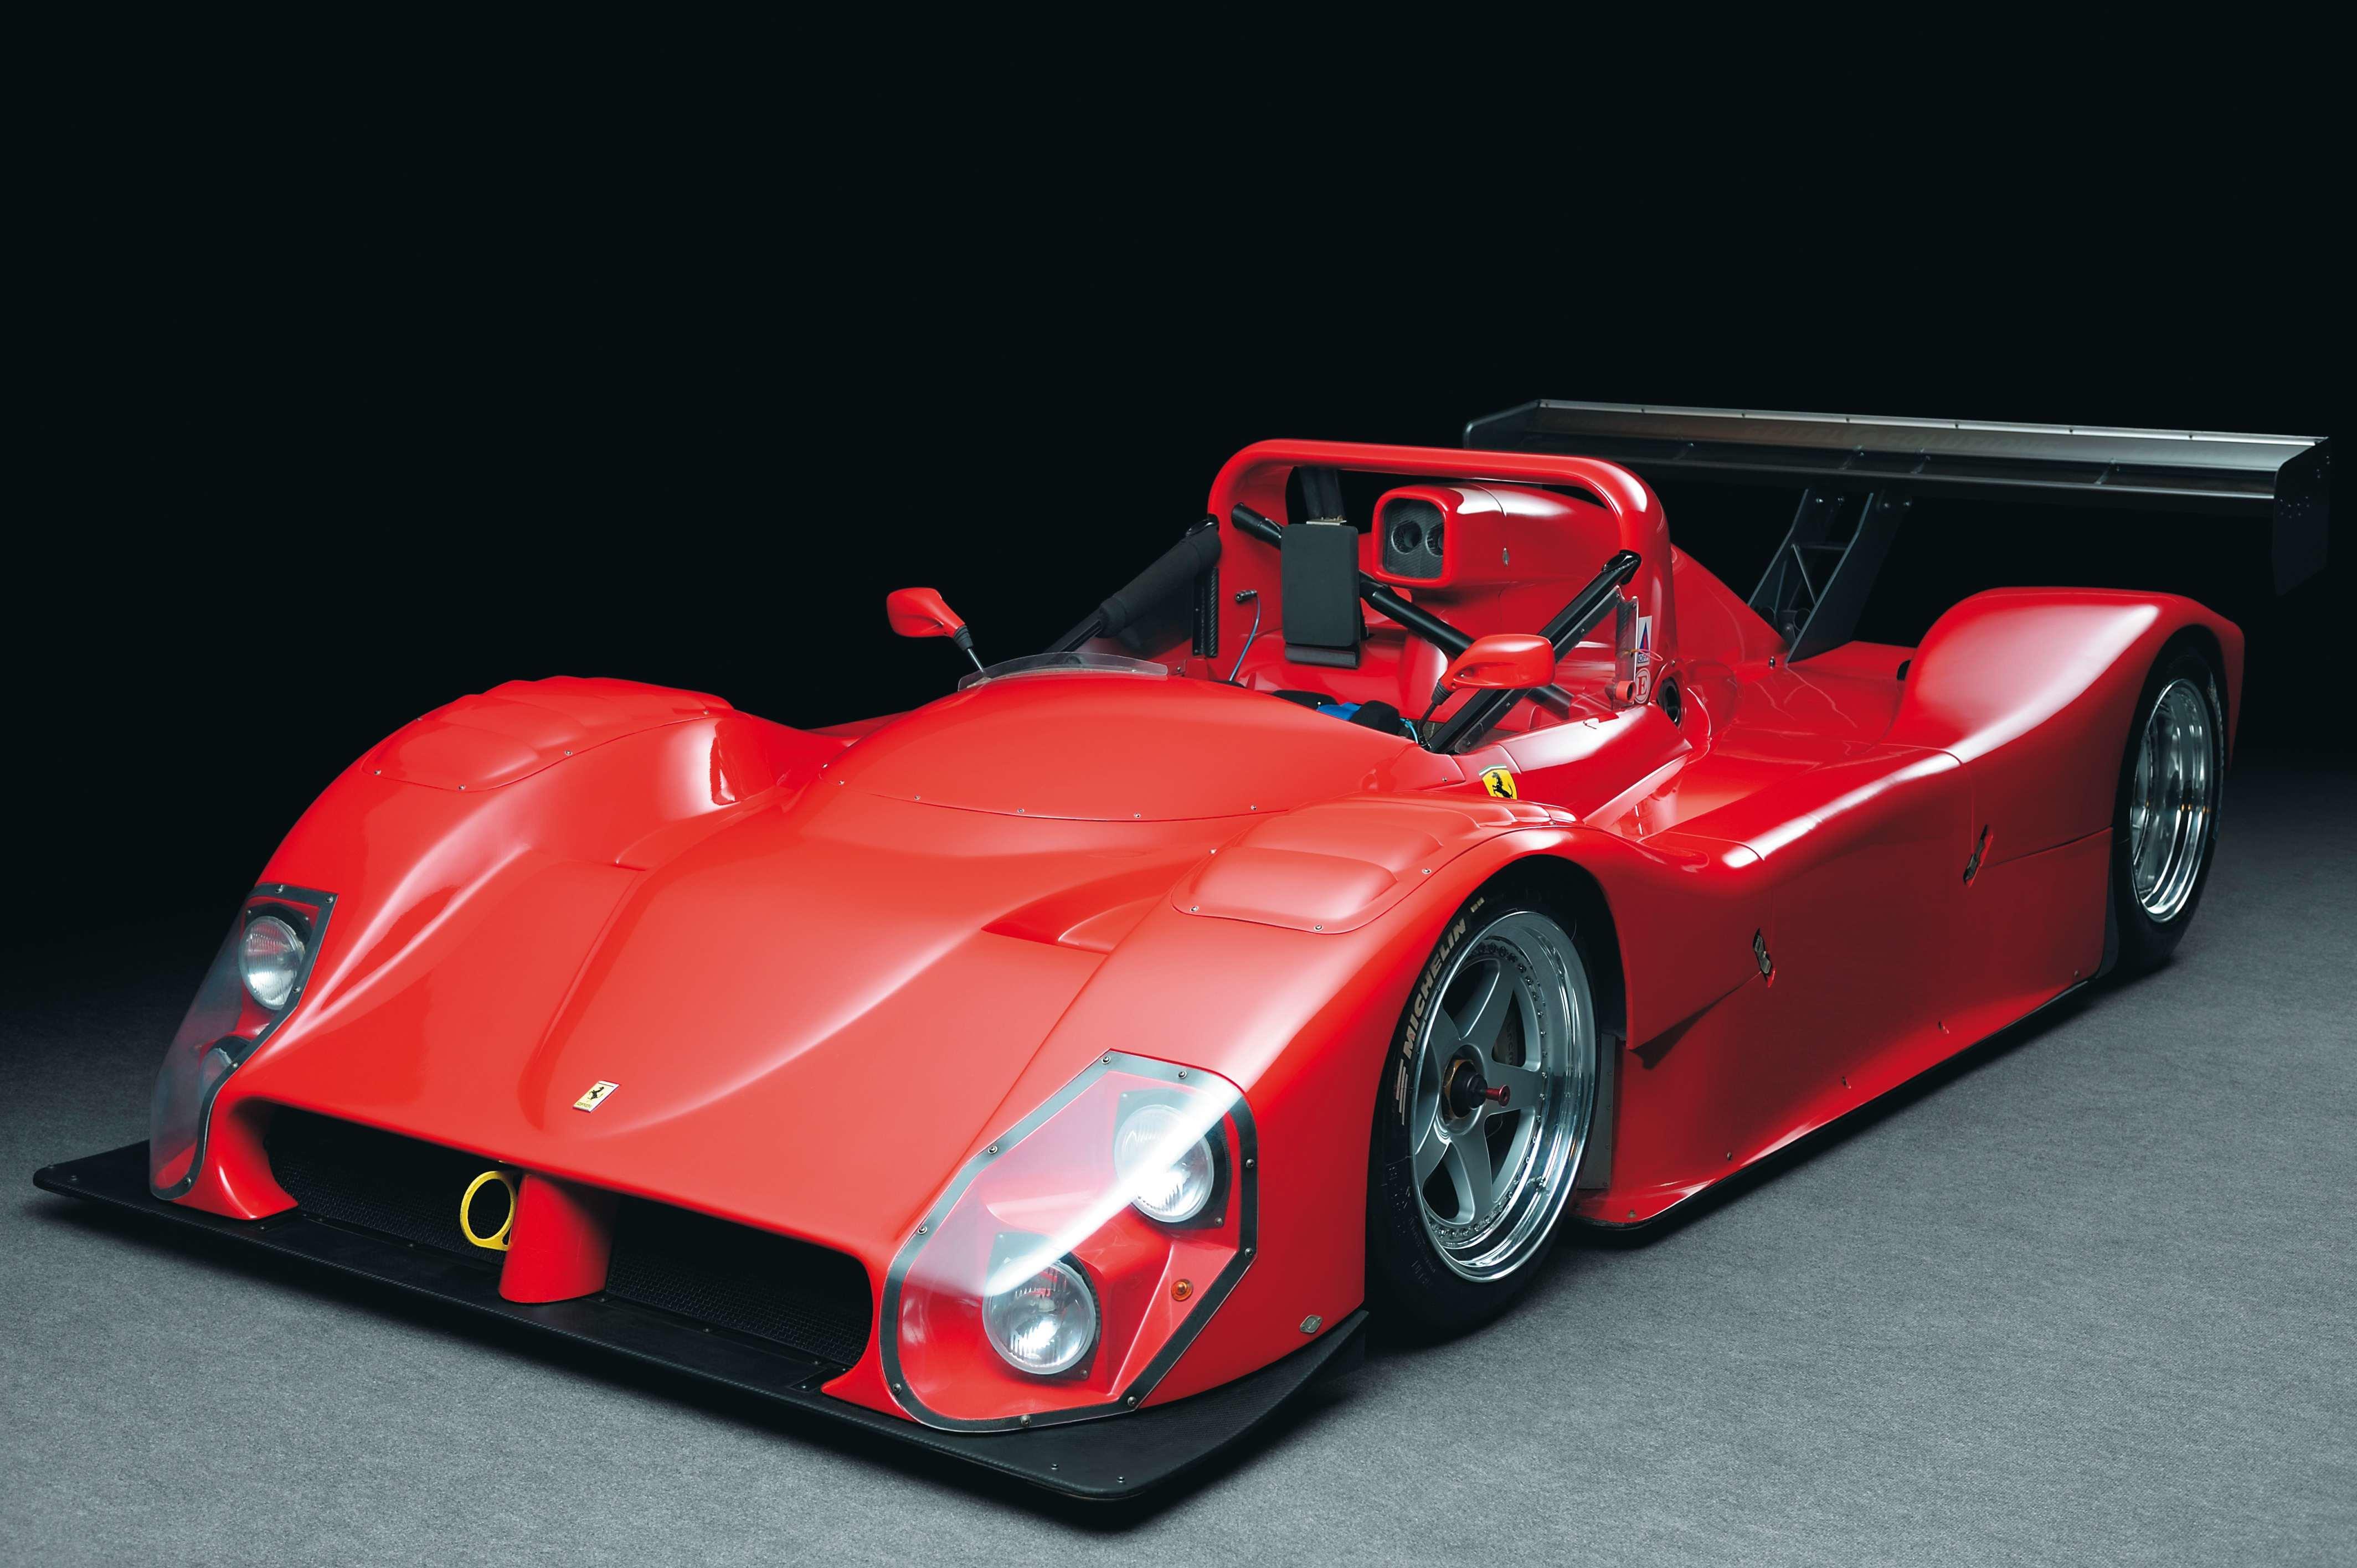 Ex-Daytona 24 Hours, penultimate built 2001 Ferrari 333SP Barchetta Chassis...